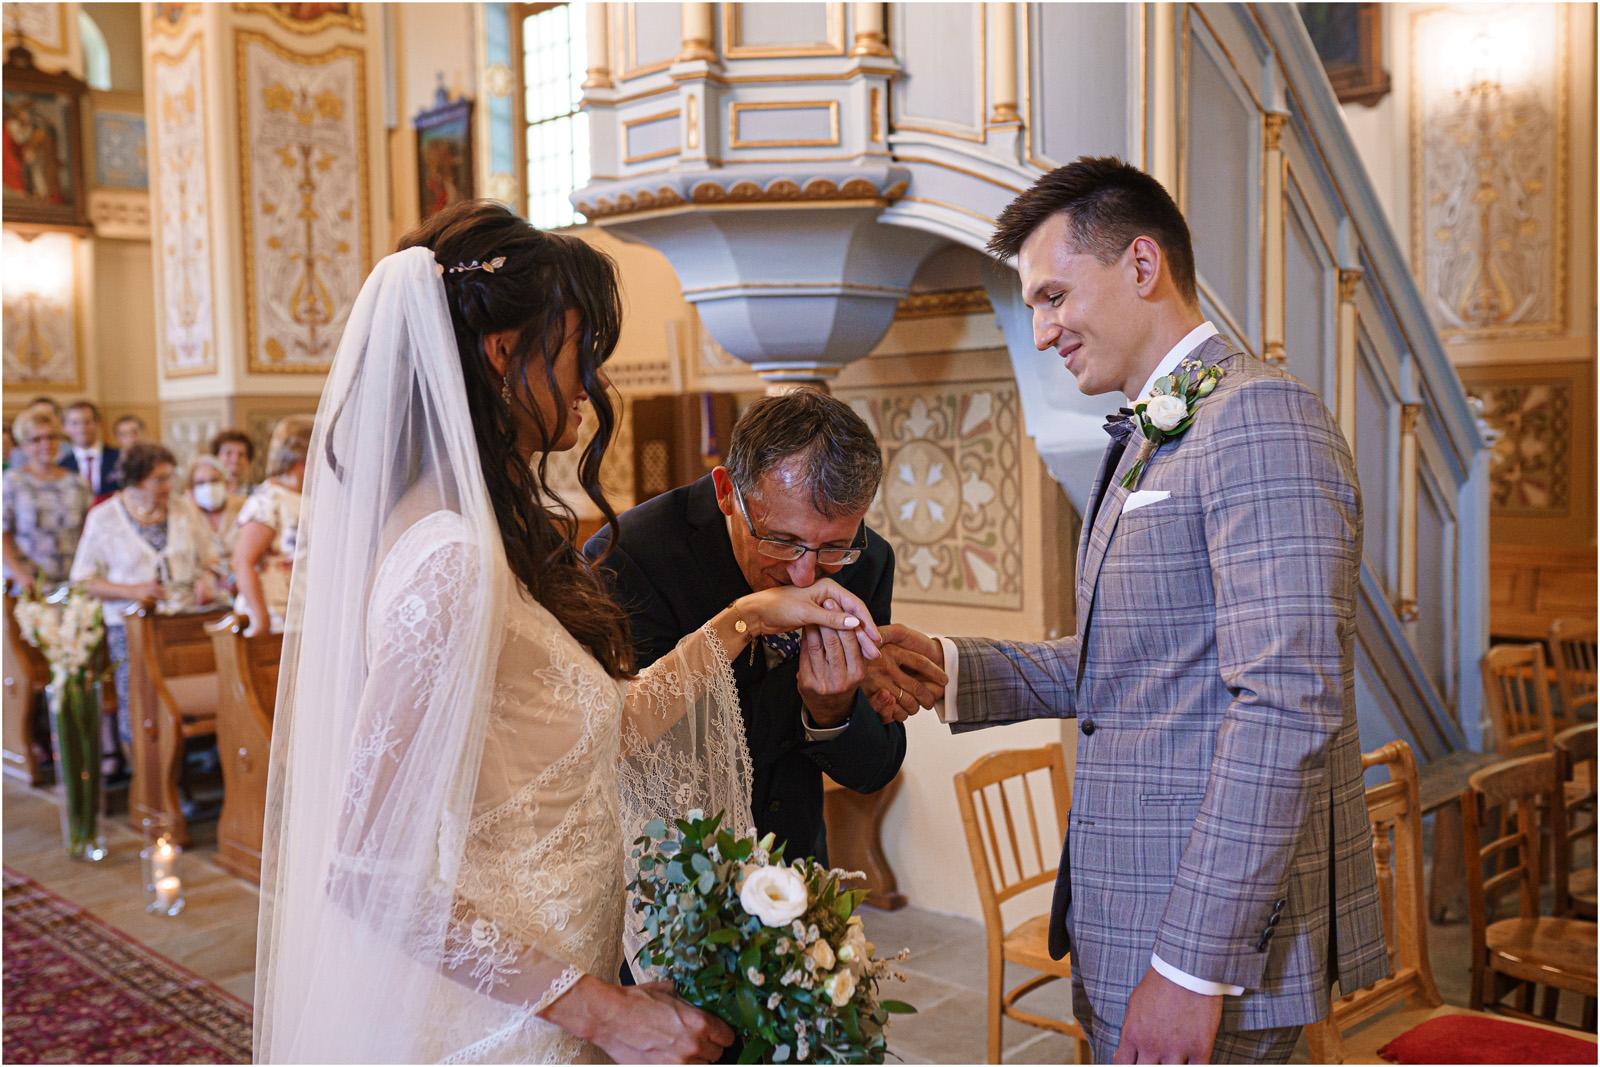 Ania & Mateusz | boho wesele w Stodole pod Kasztanami 41